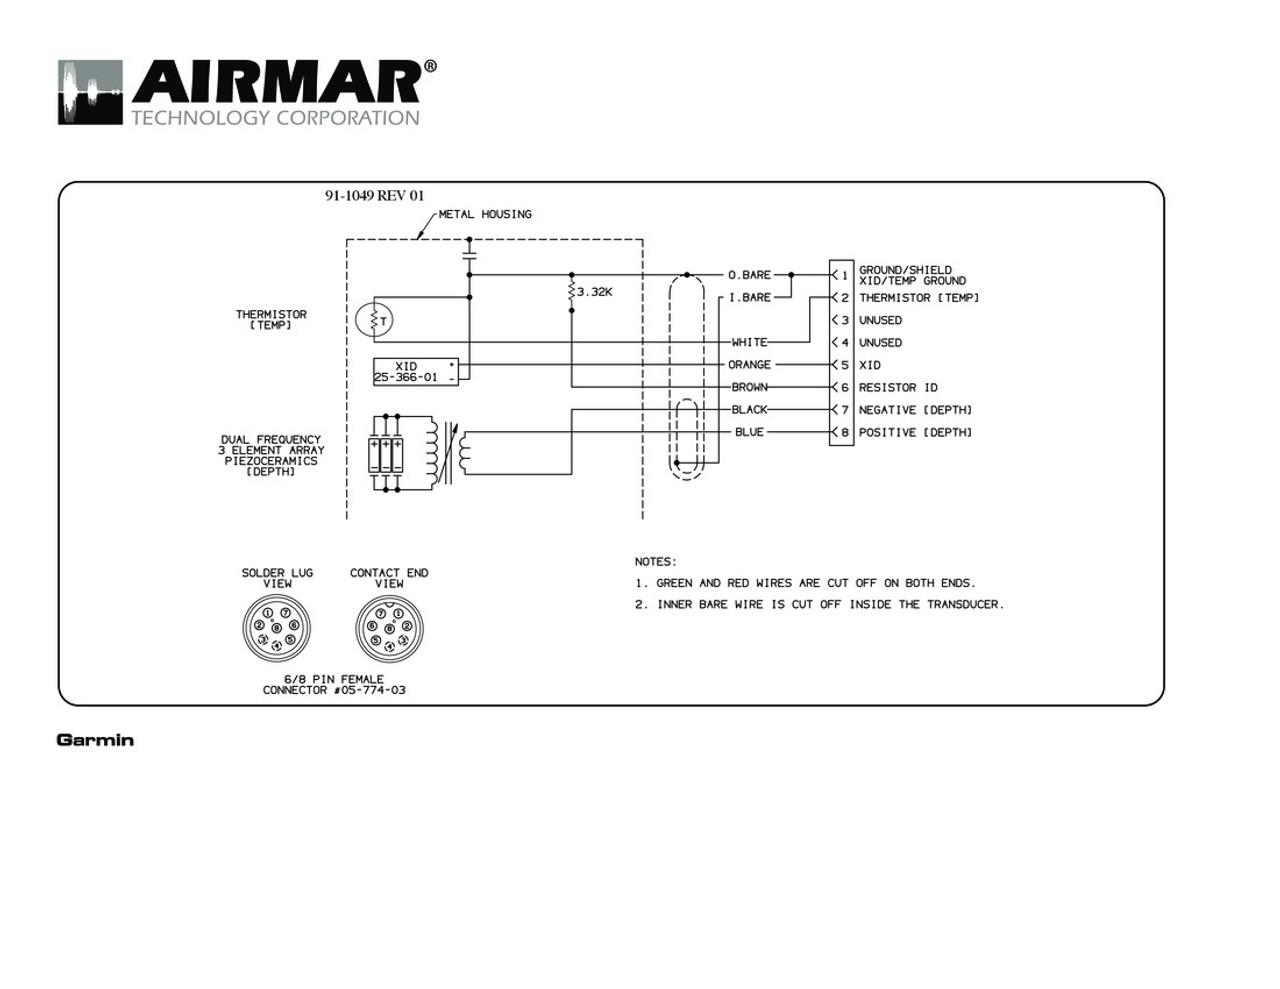 Airmar Wiring Diagram Garmin B164 8 pin (D,T) | Blue Bottle ... on